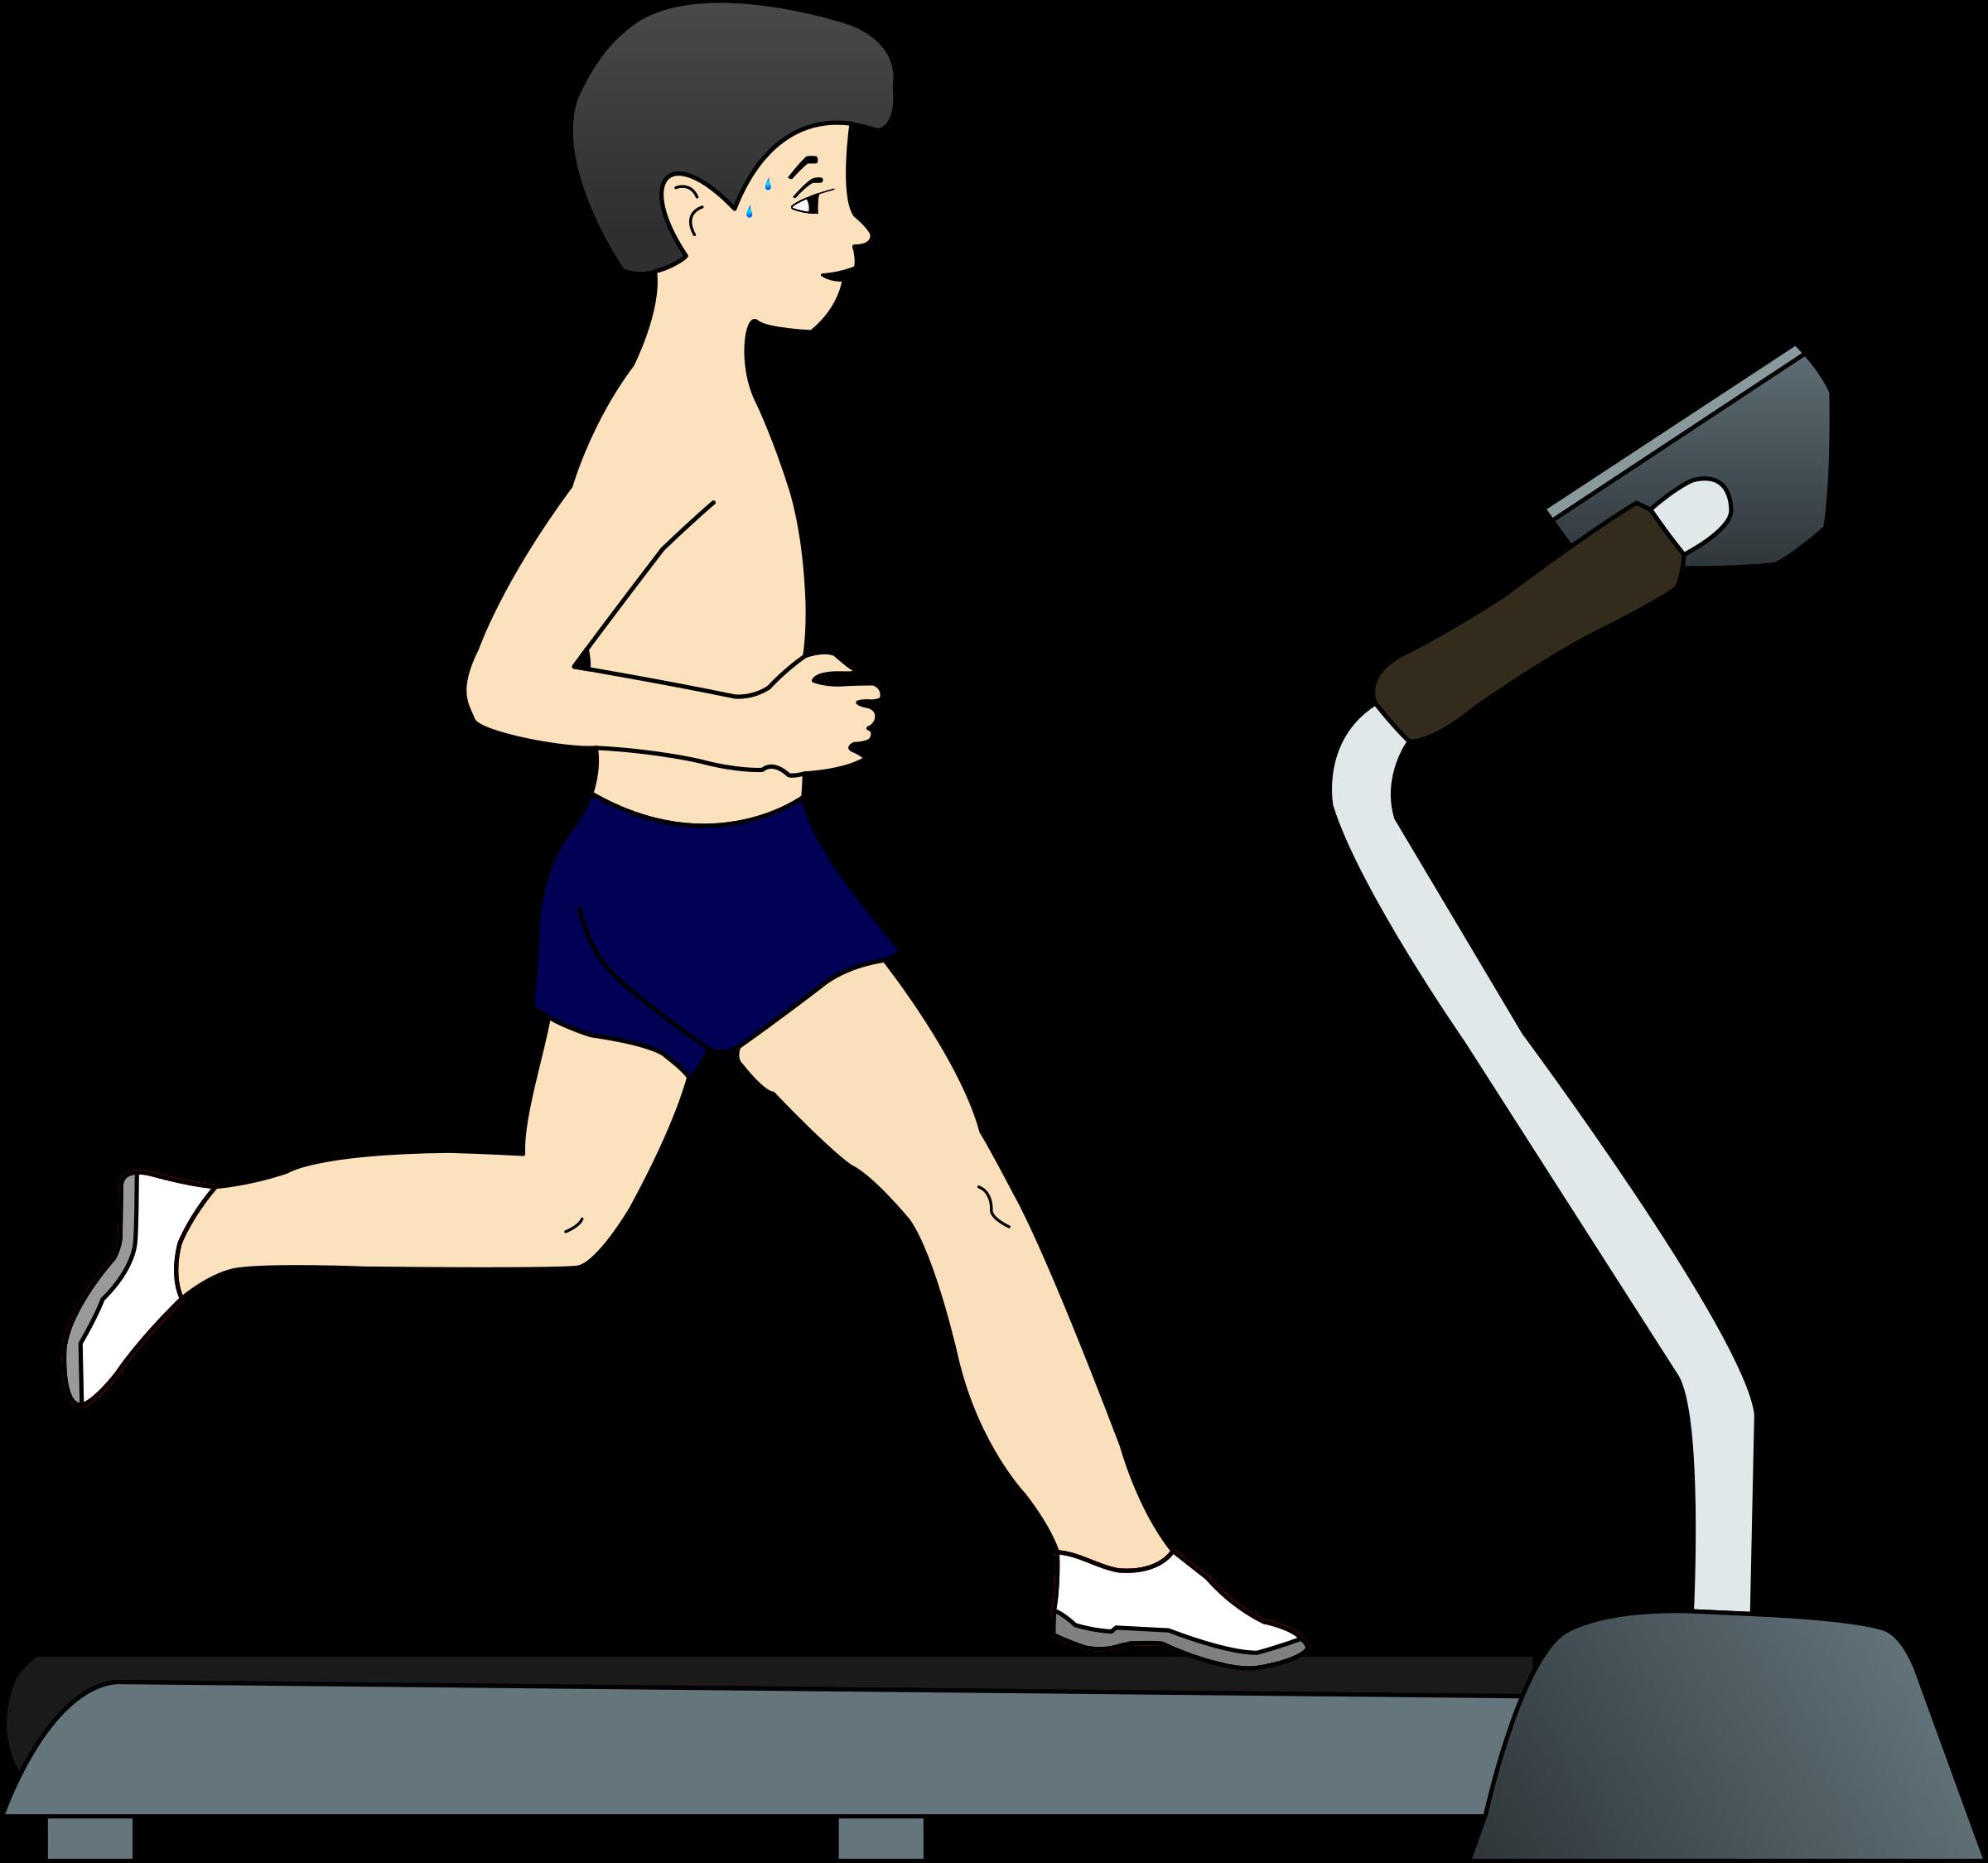 Boy running on treadmill. Exercising clipart icon